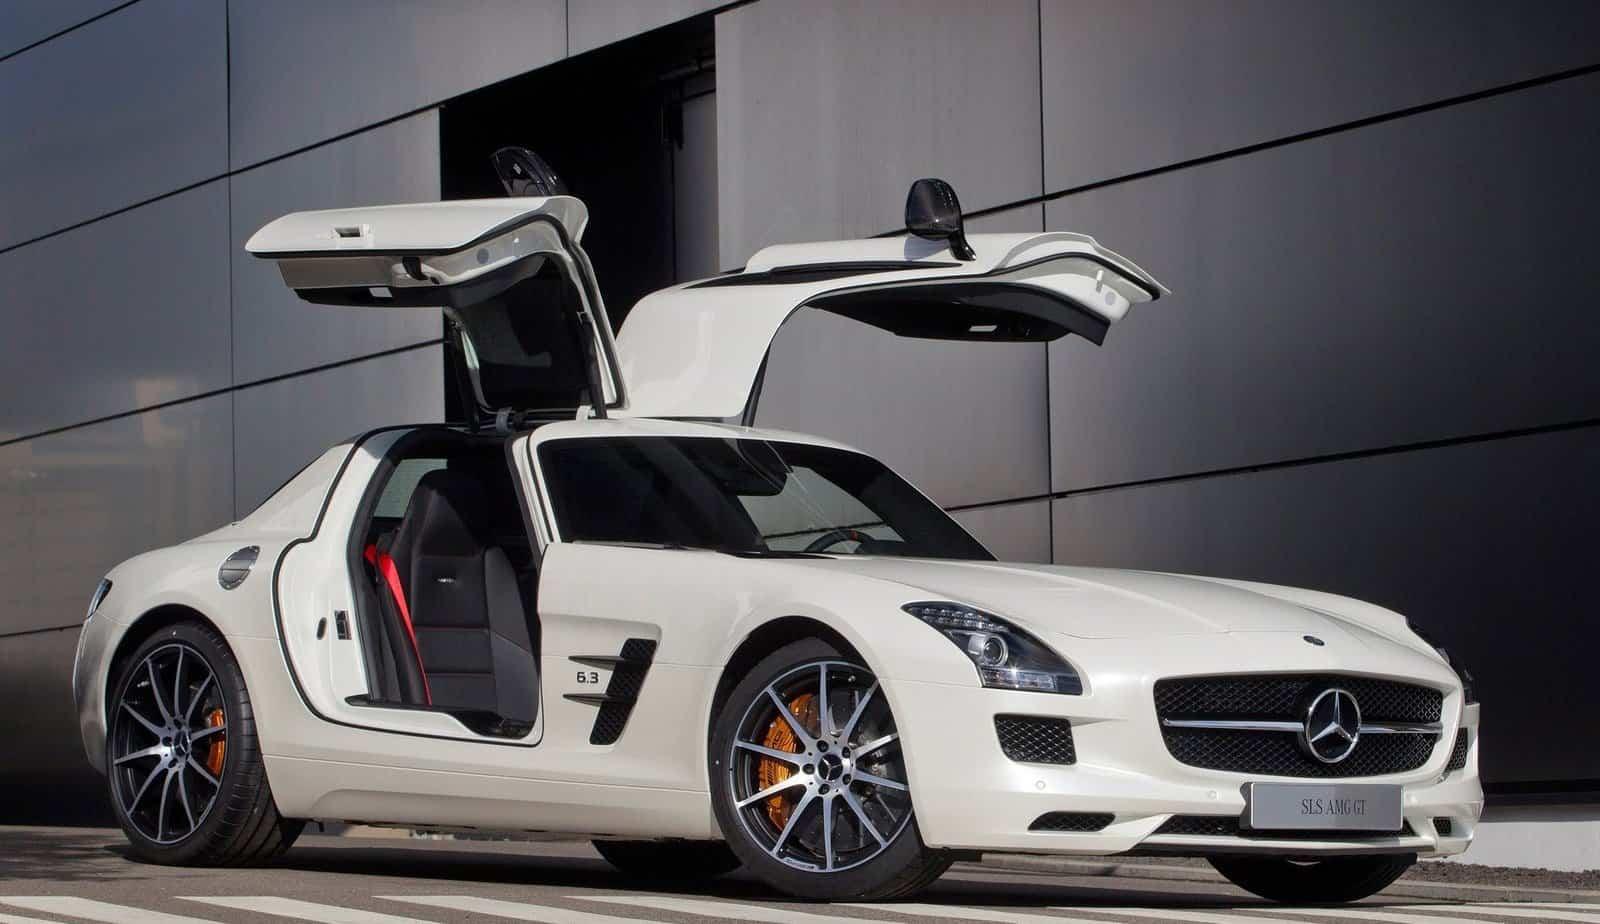 Dream-Cars-Mercedes-Benz-SLS-AMG-GT-Beverly-Hills-Magazine-1